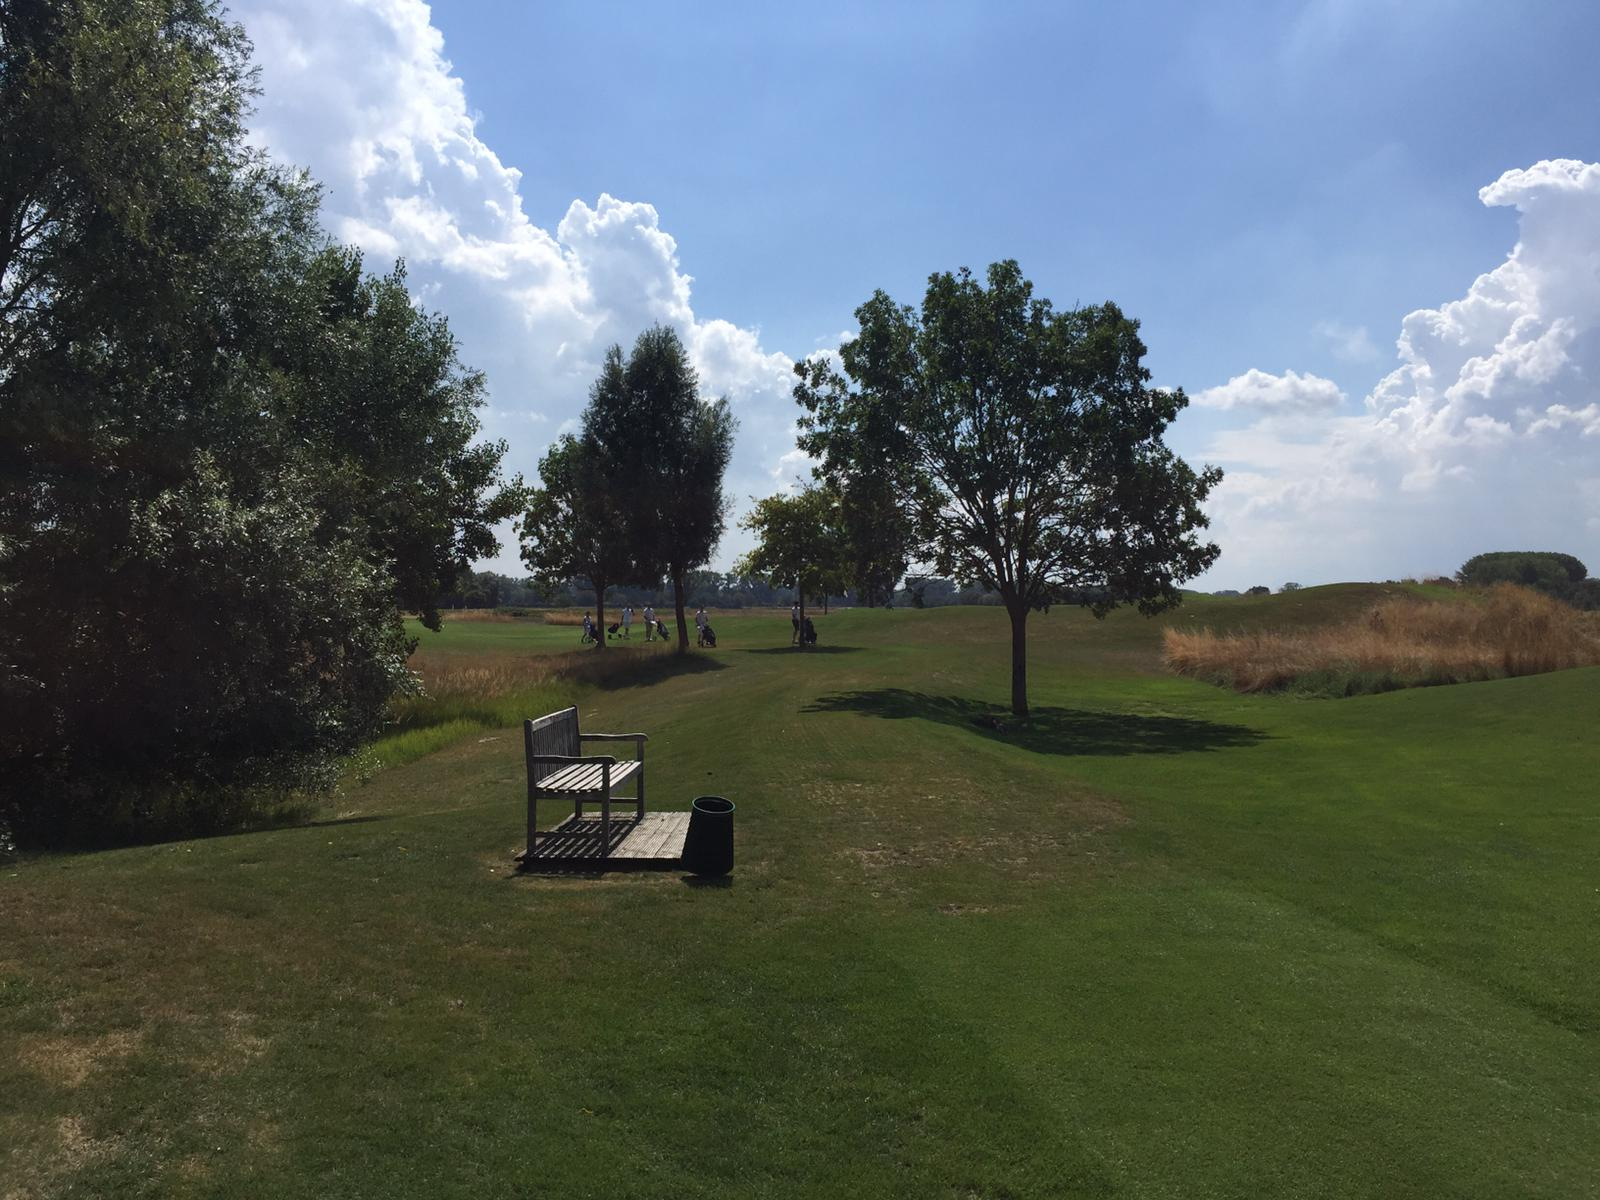 4_Golfturnier_Soroptimist_Golf_en_blanc